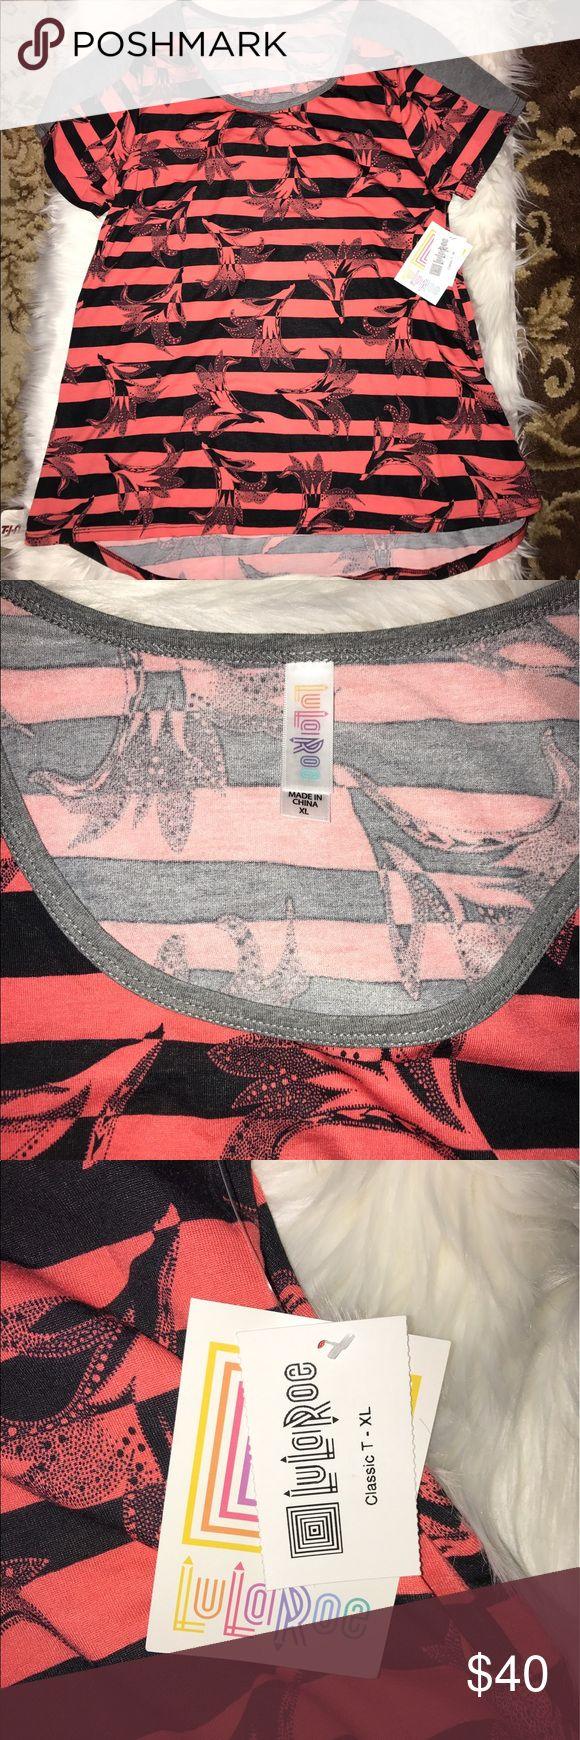 Shirt design measurements - Lularoe Classic Tee Xl Brand New Lularoe Classic Tee In Size Xl A Very Unique